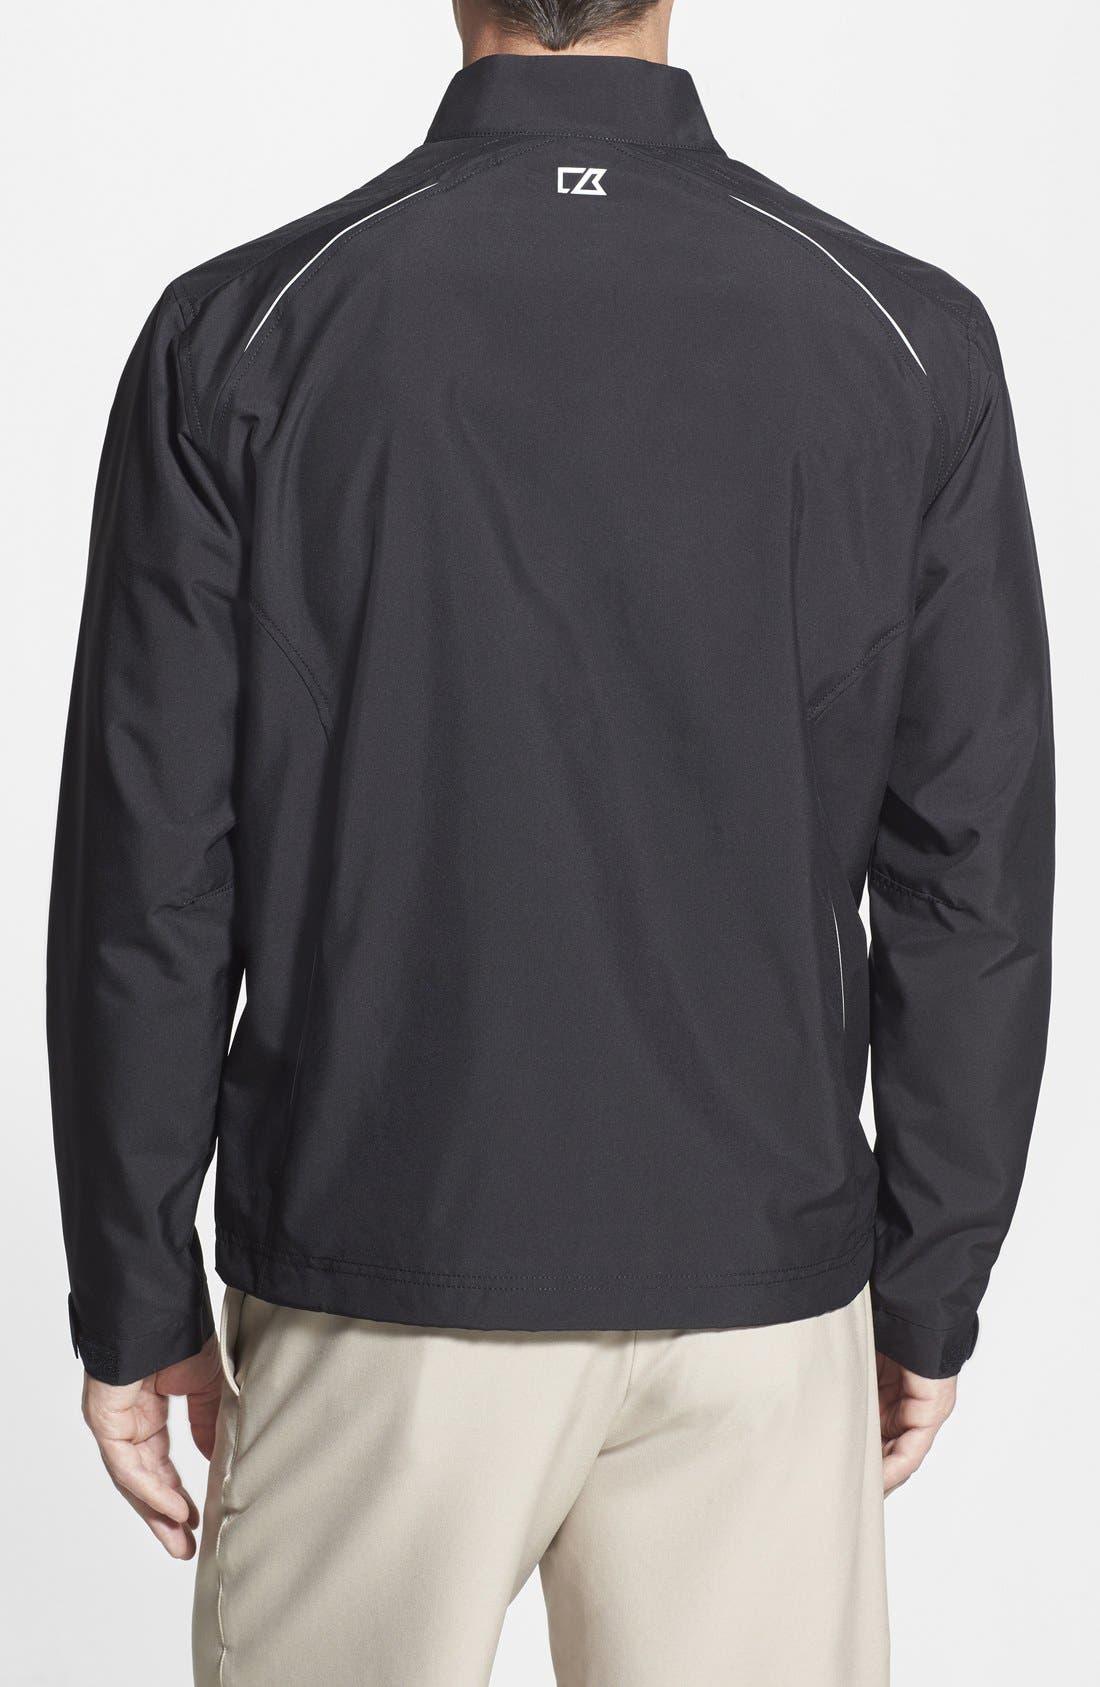 Cincinnati Bengals - Beacon WeatherTec Wind & Water Resistant Jacket,                             Alternate thumbnail 2, color,                             Black